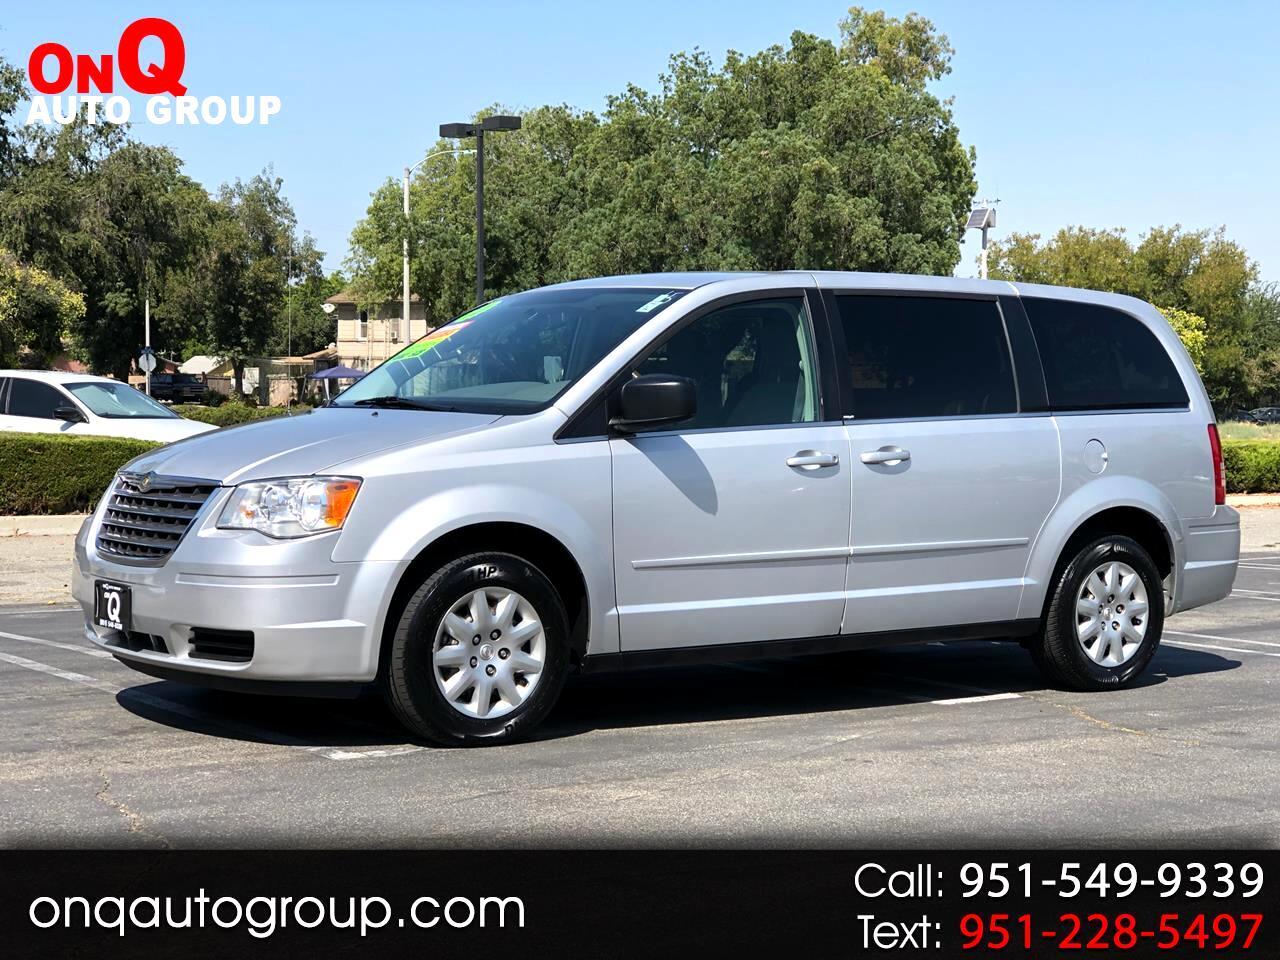 2010 Chrysler Town & Country 4dr Wgn LX *Ltd Avail*